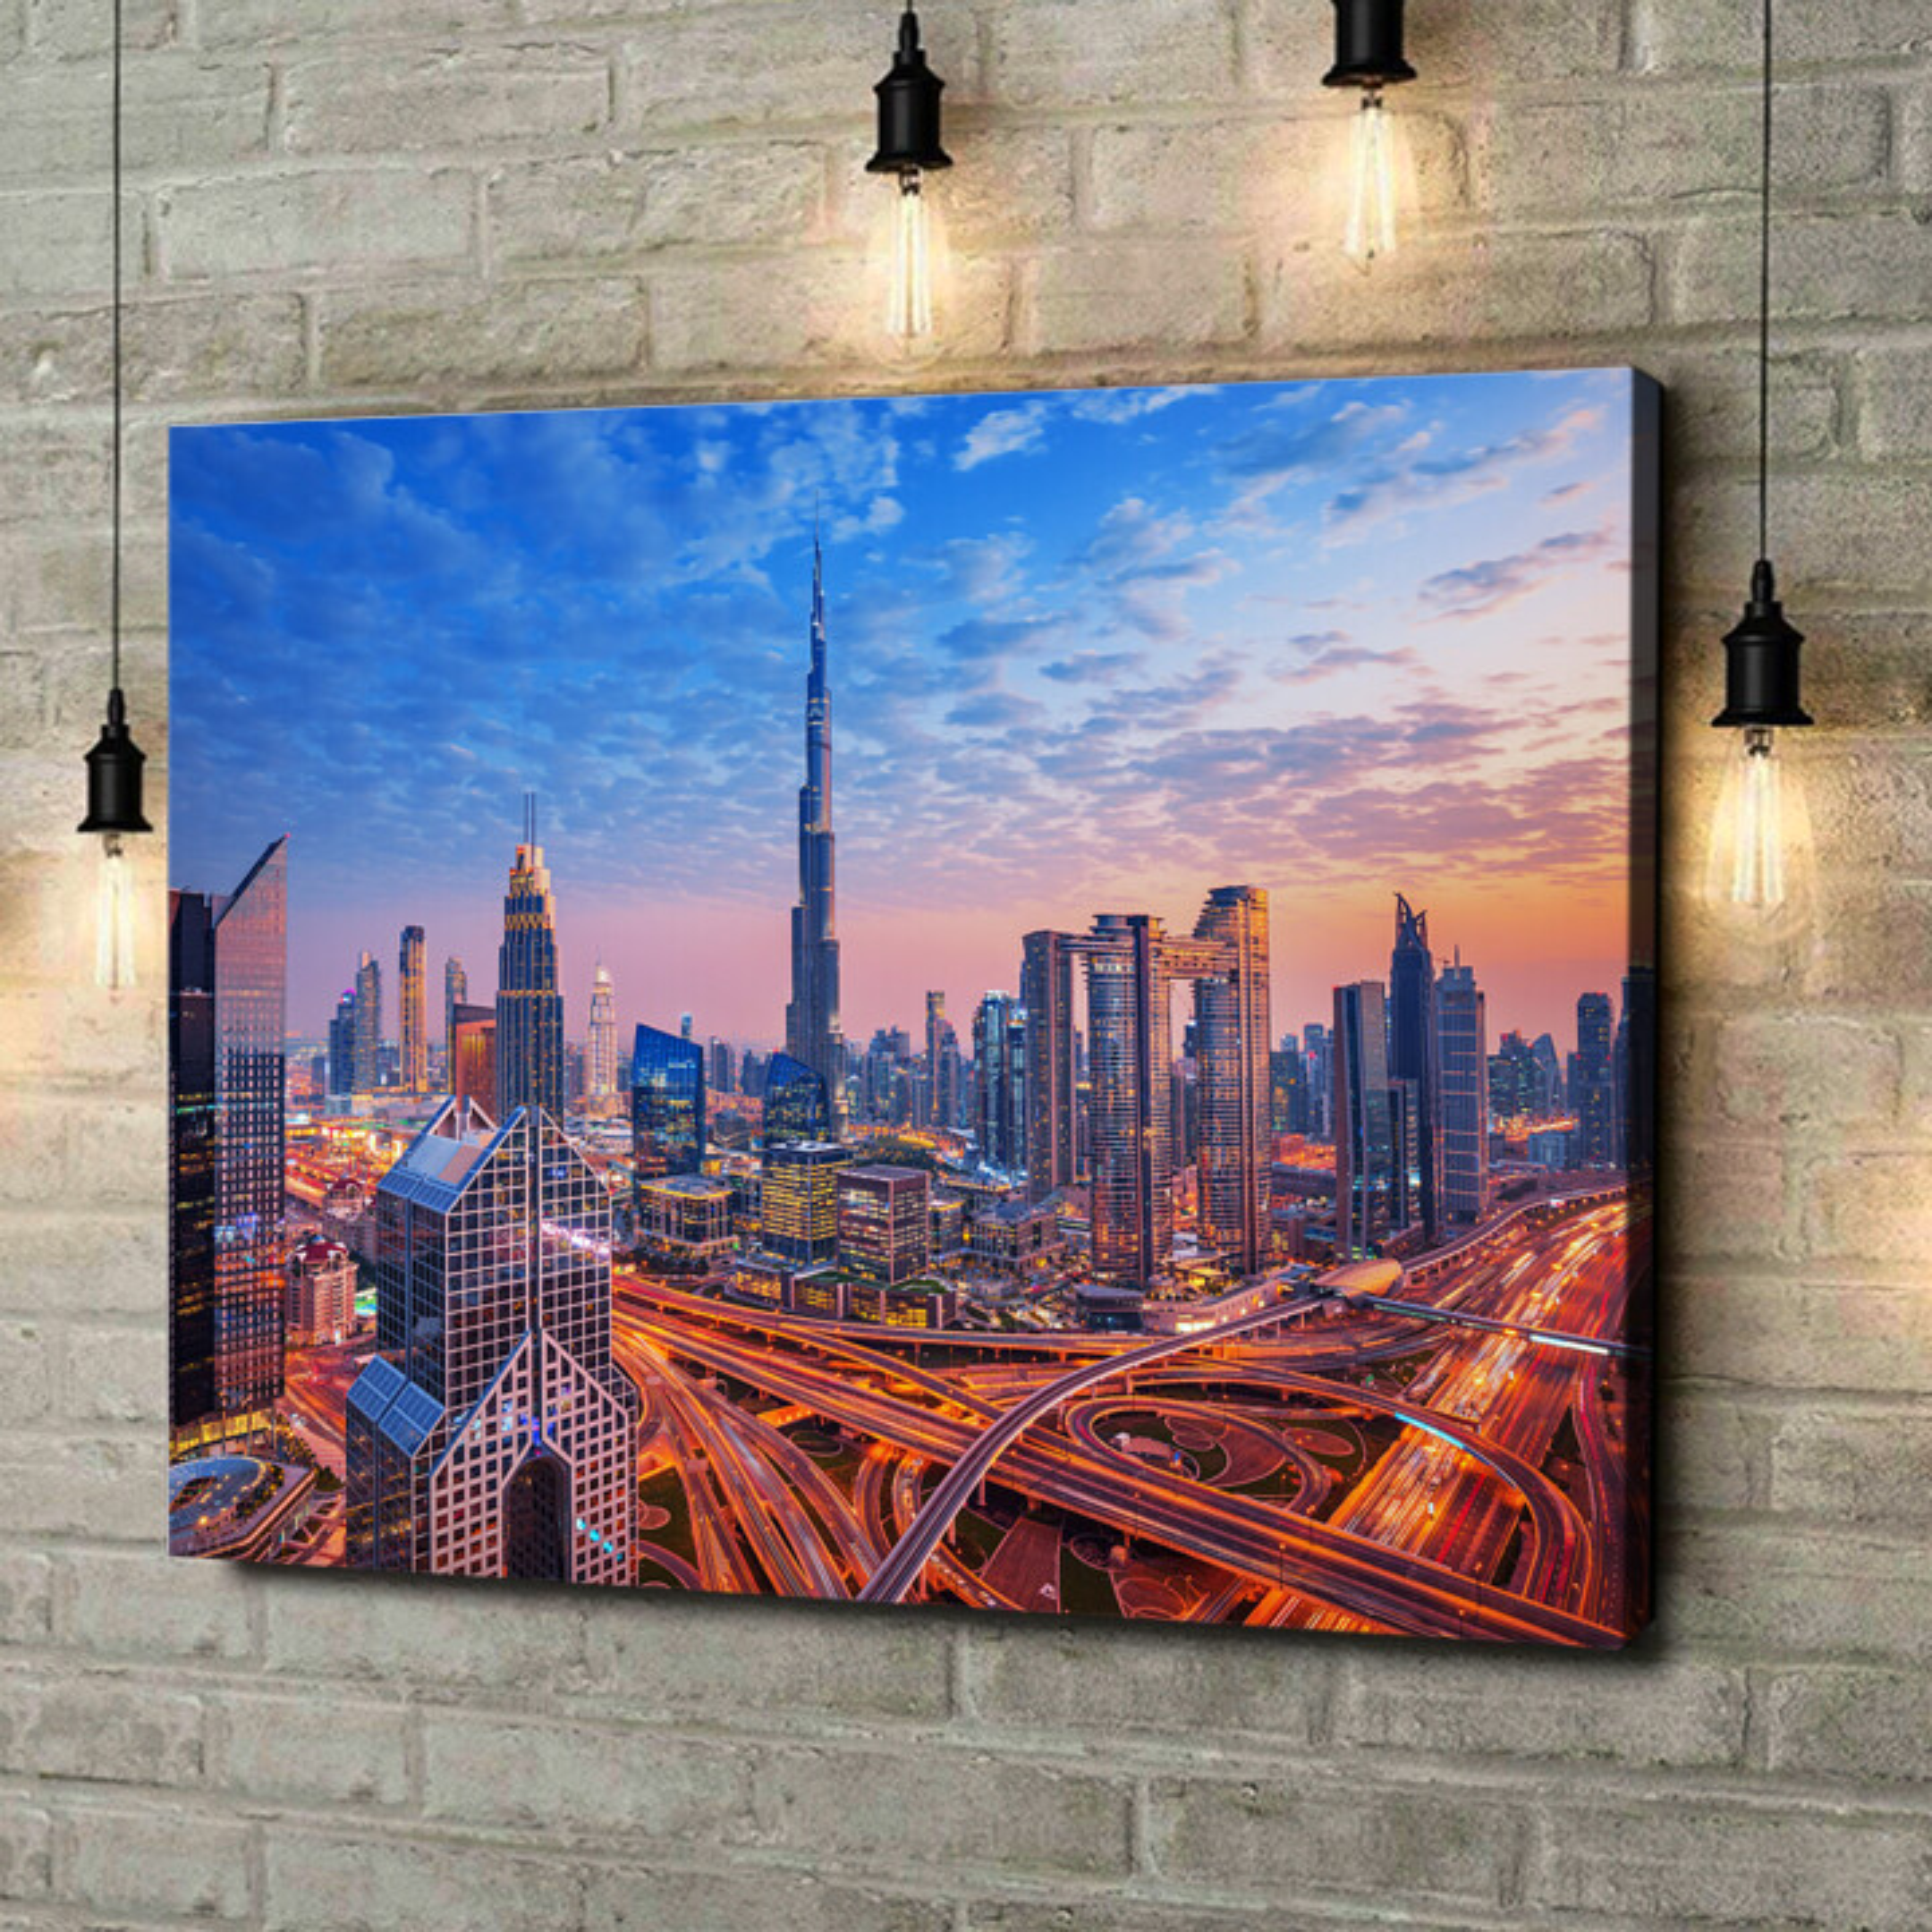 Leinwandbild personalisiert Dubai Skyline